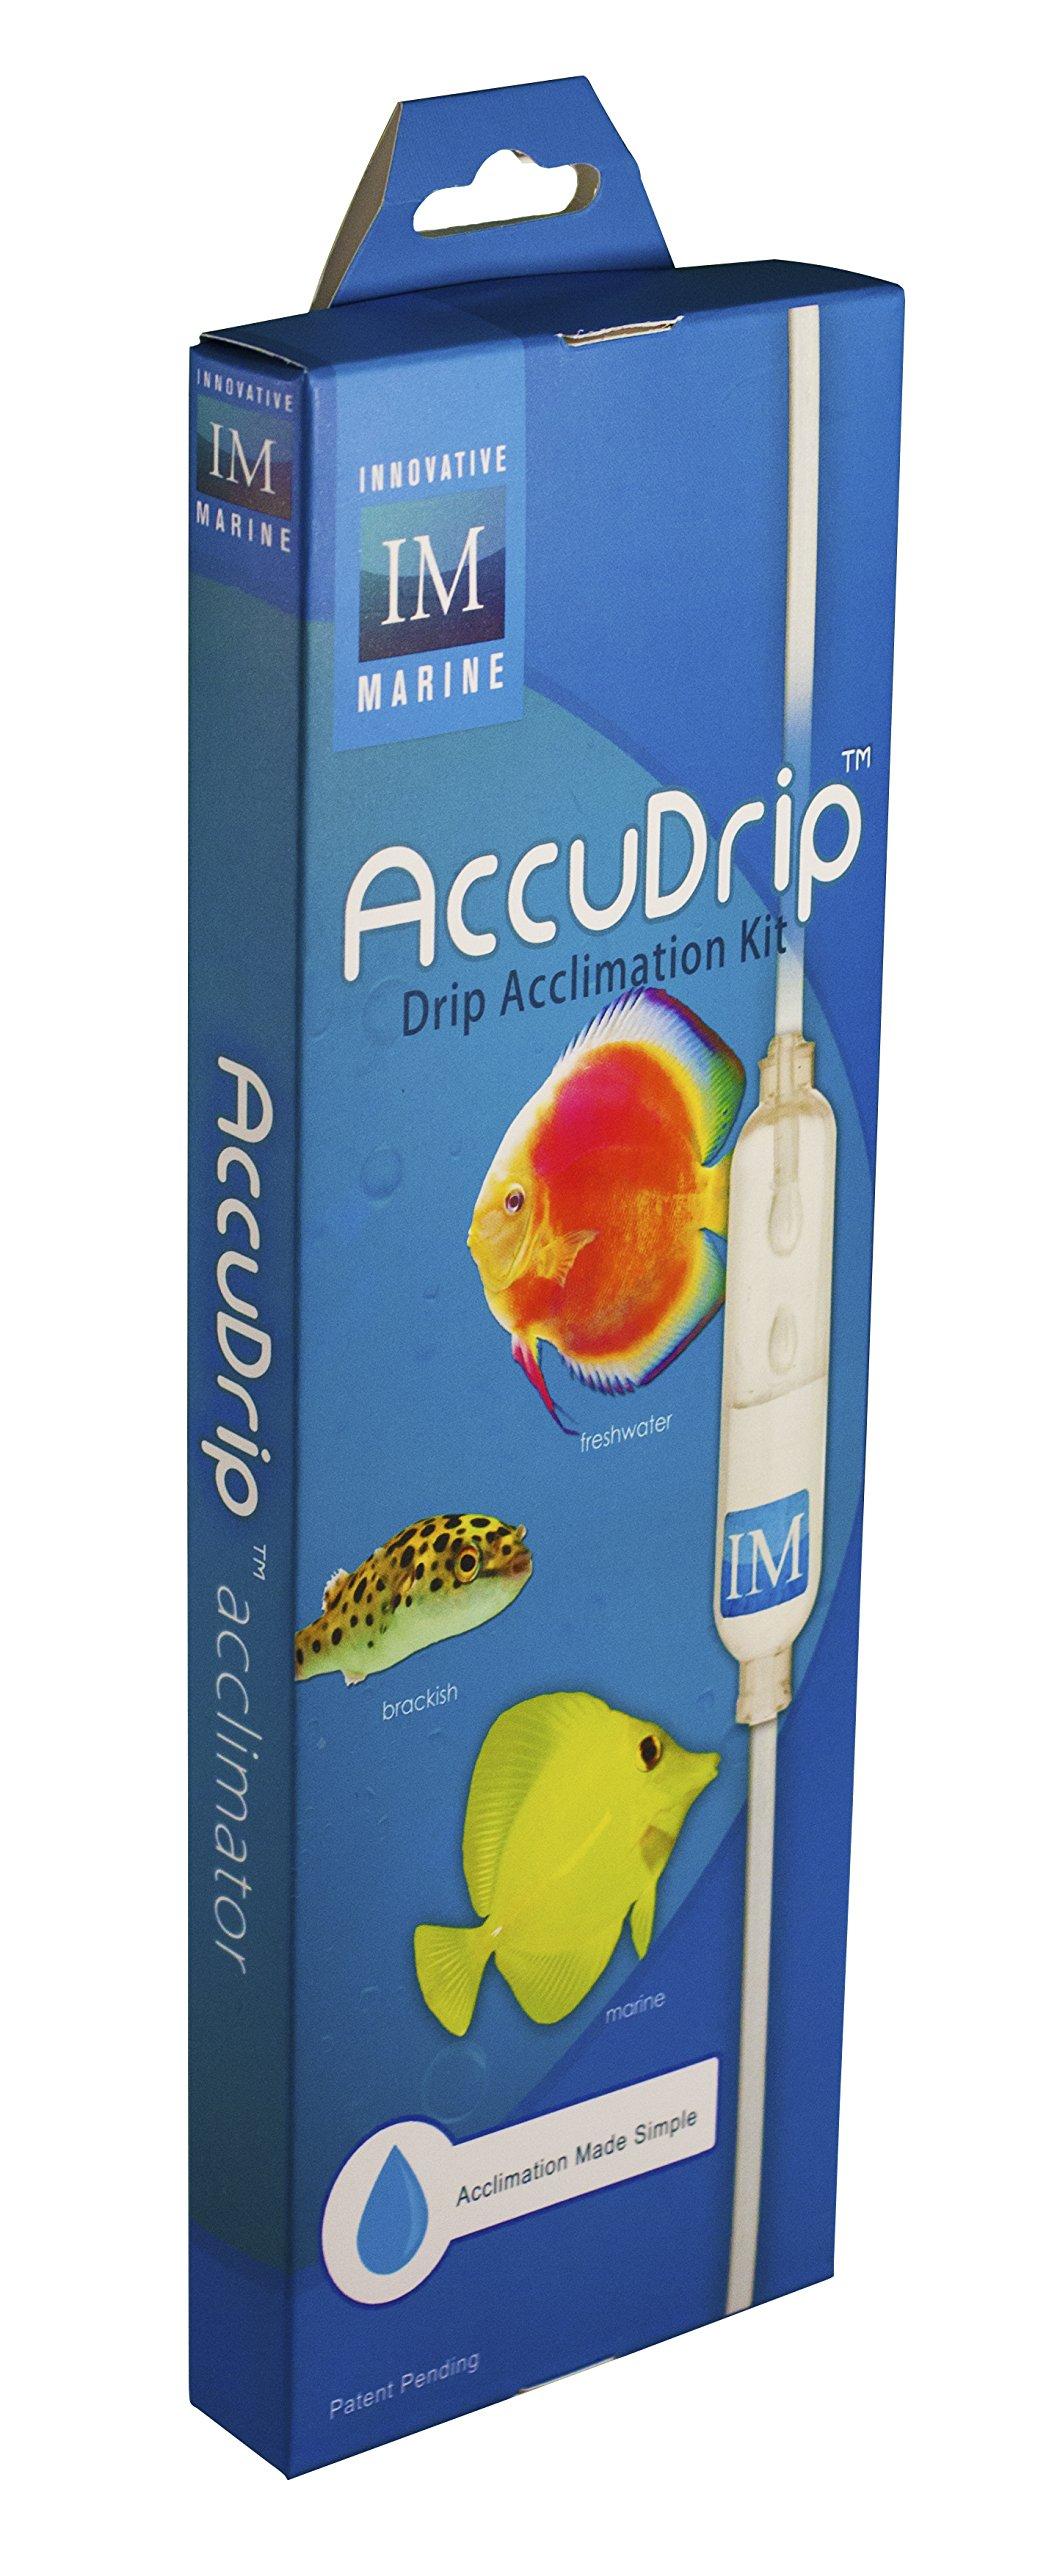 Innovative Marine Accudrip Acclimator